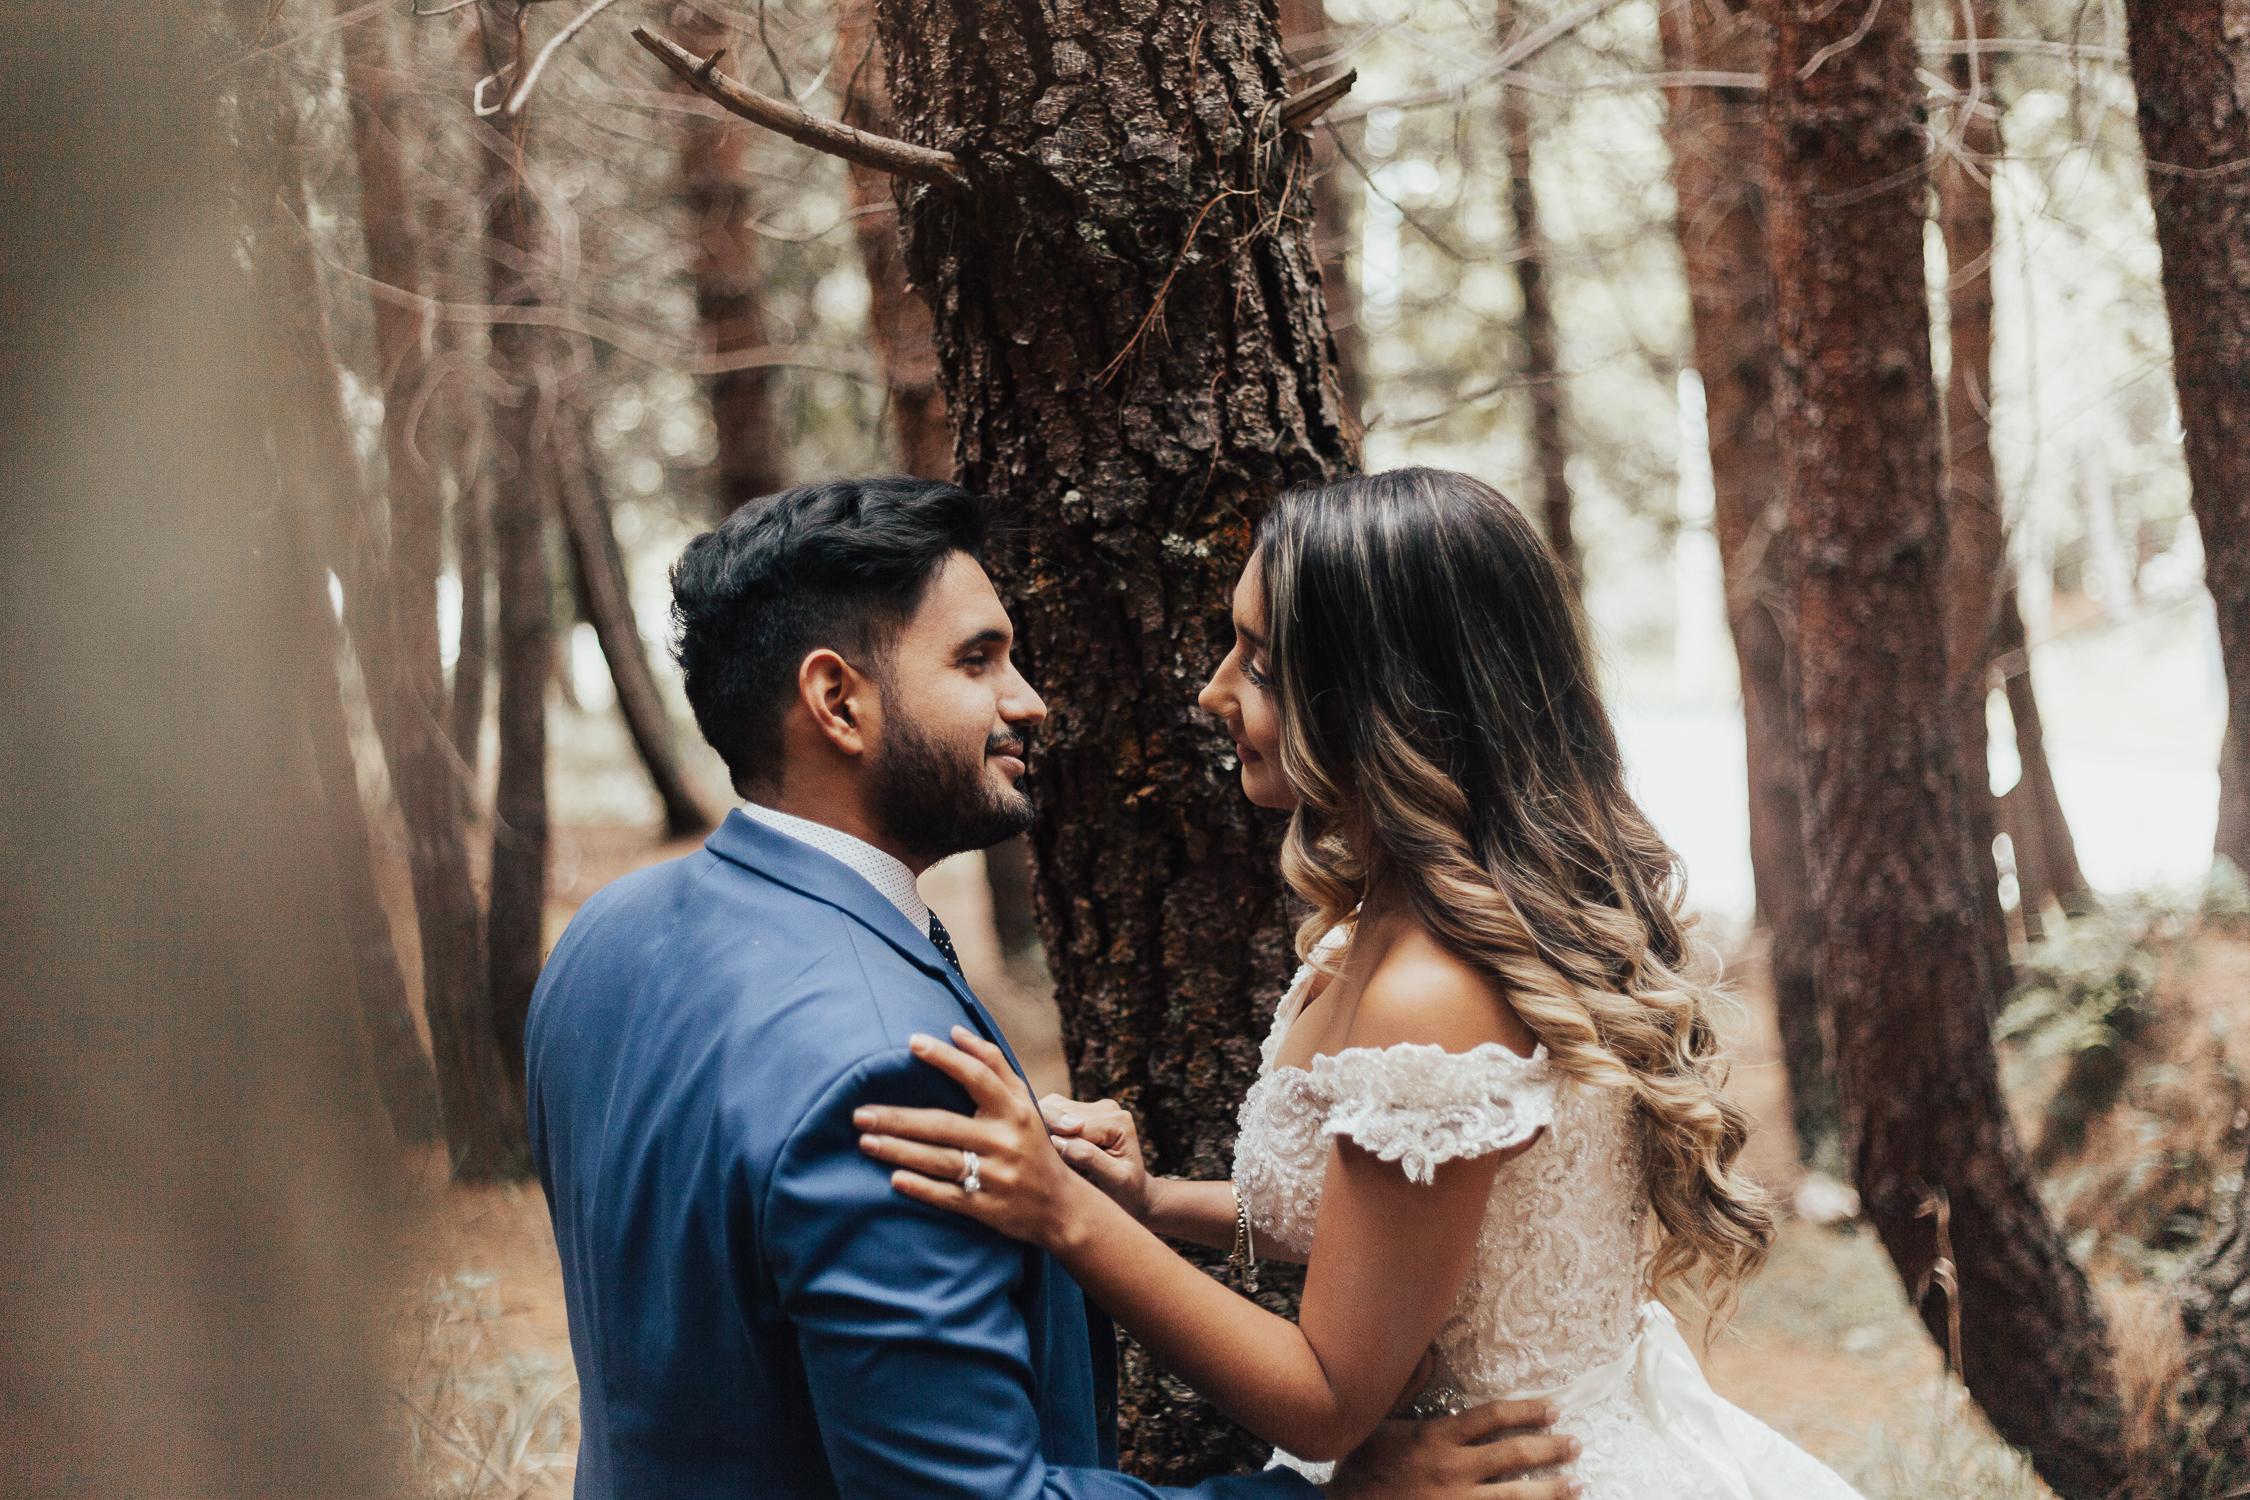 Michelle-Agurto-Fotografia-Bodas-Destination-Wedding-Photographer-Ecuador-Sesion-Johanna-Eduardo-68.JPG